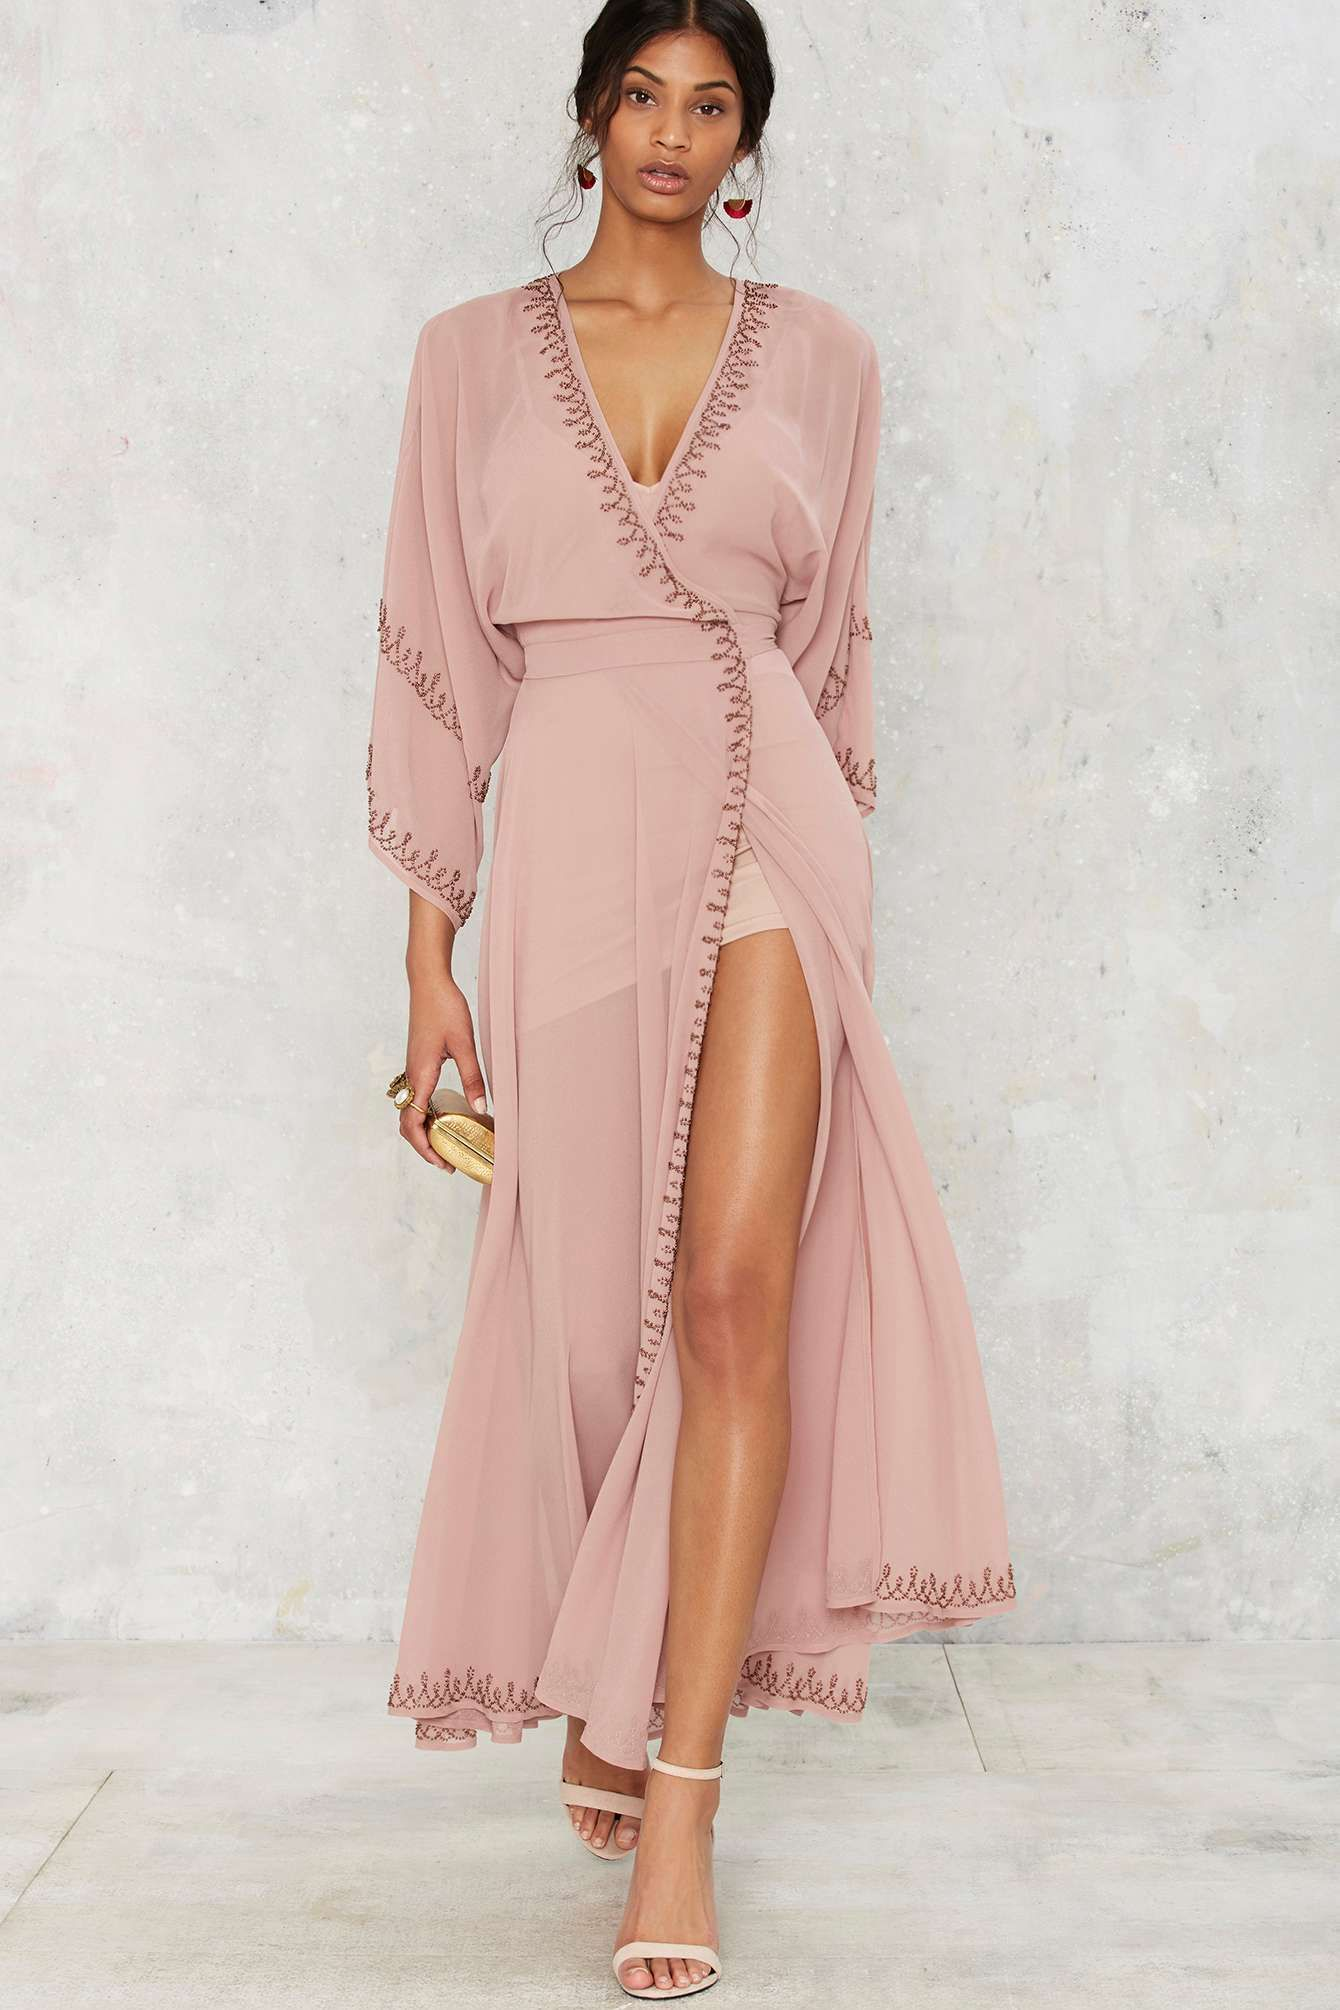 Inspirant Robe De Chambre Femme Pas Cher Artamplitude